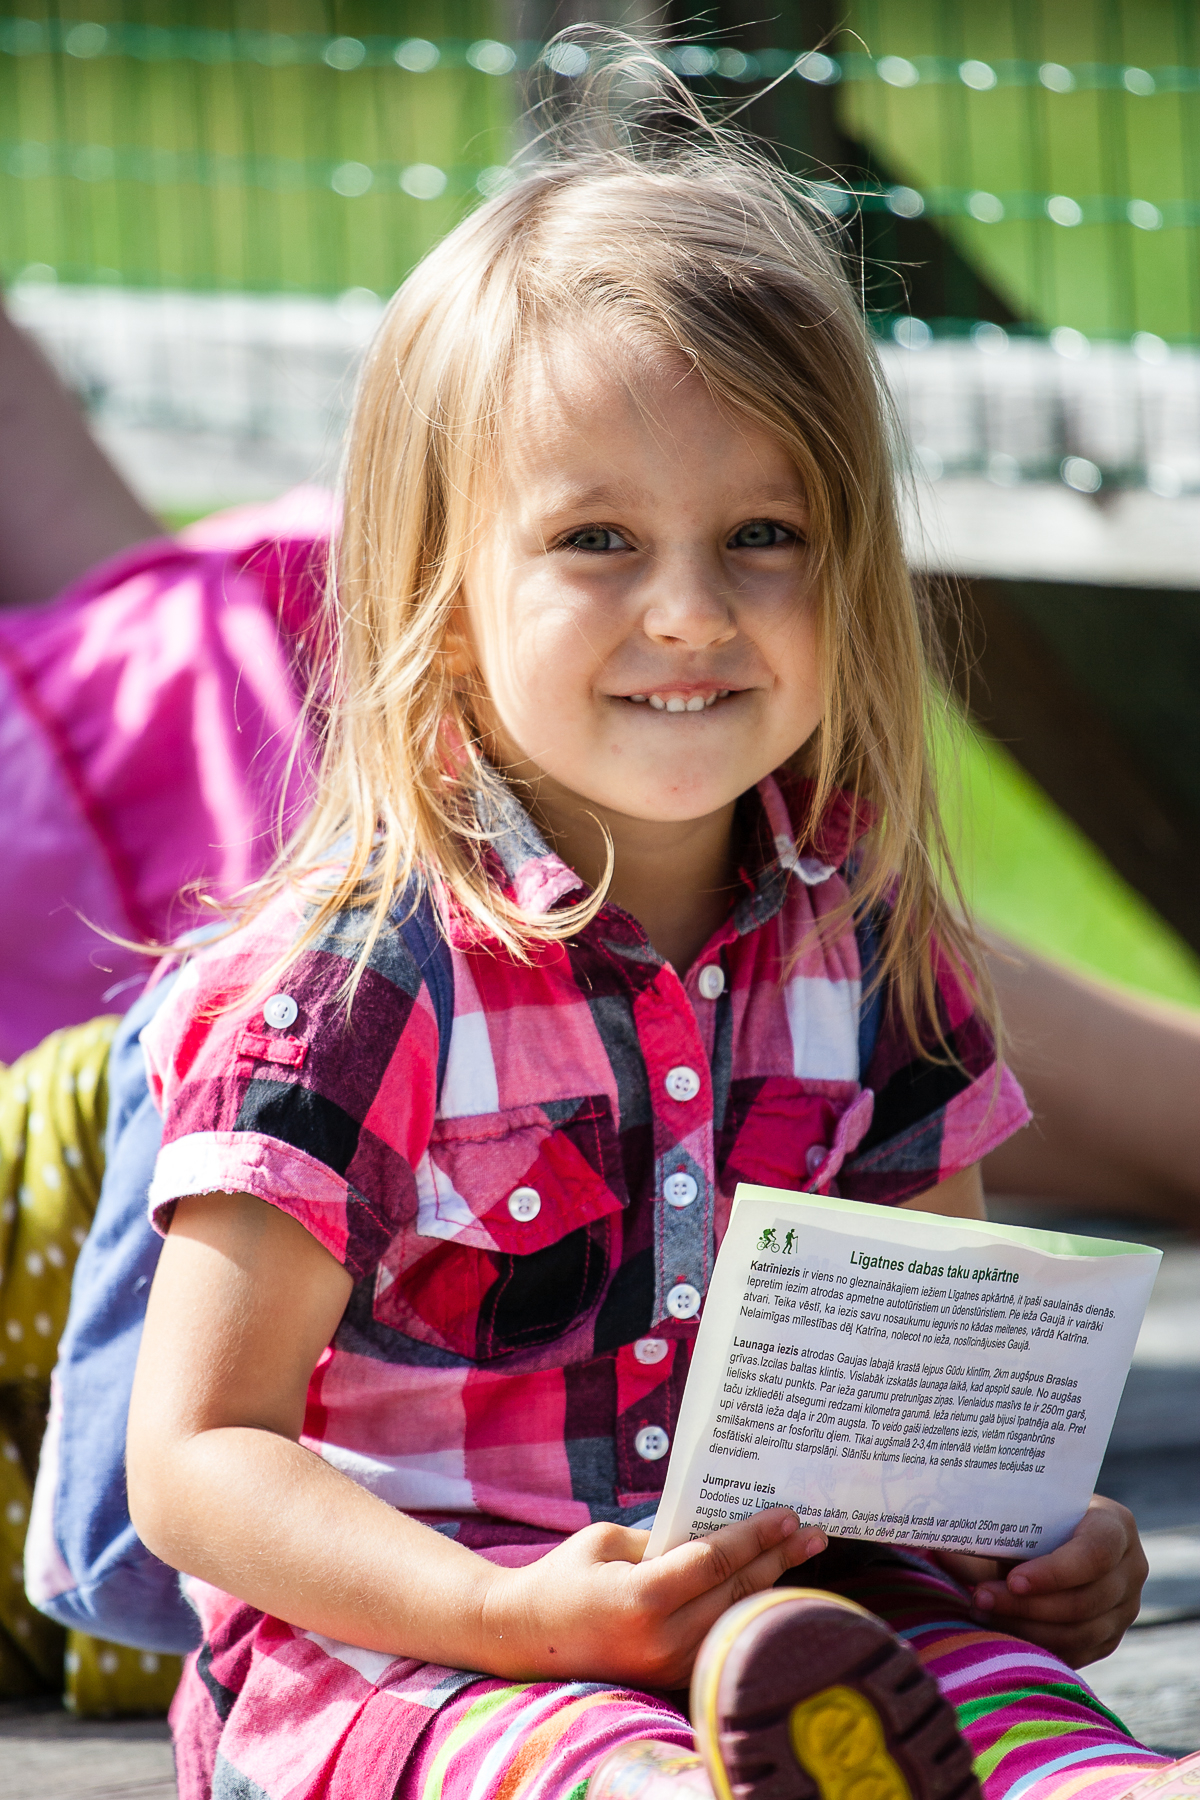 Little Reader Via @Atisgailis